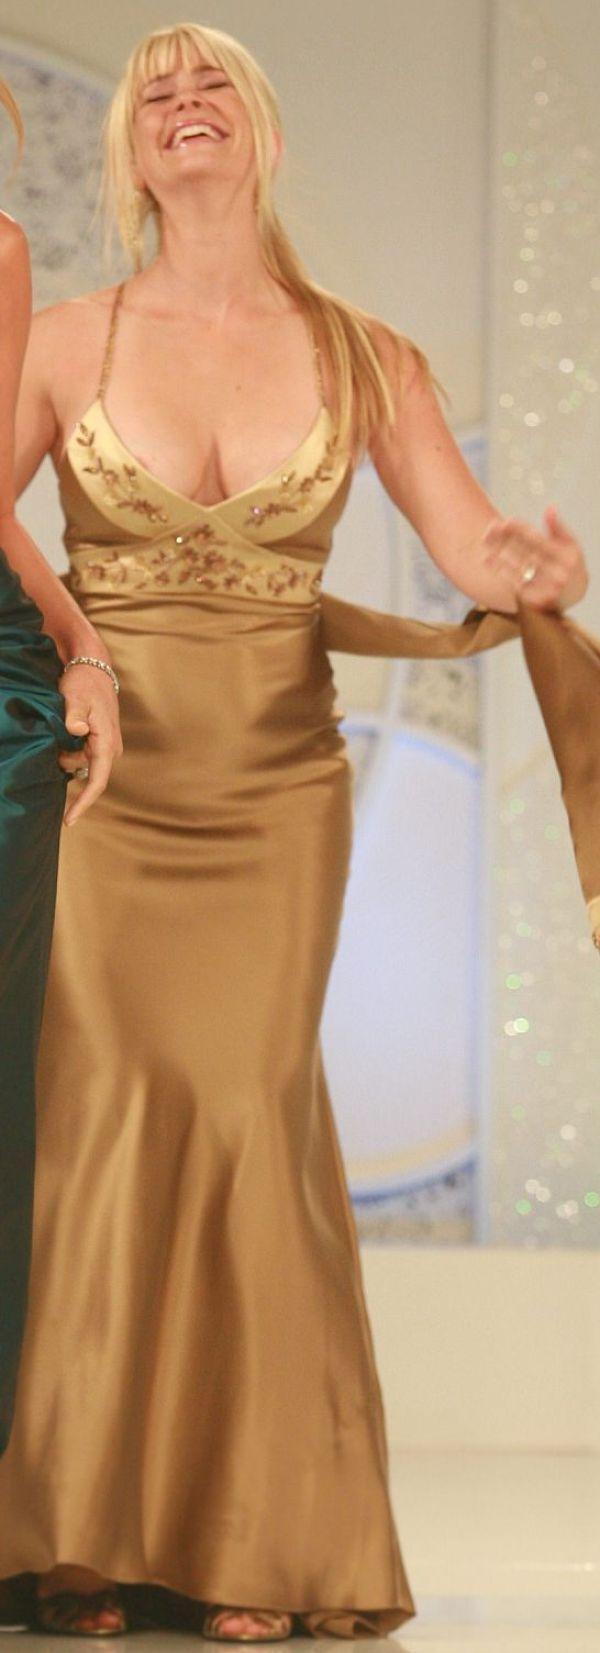 Nip slip wedding dresses topless